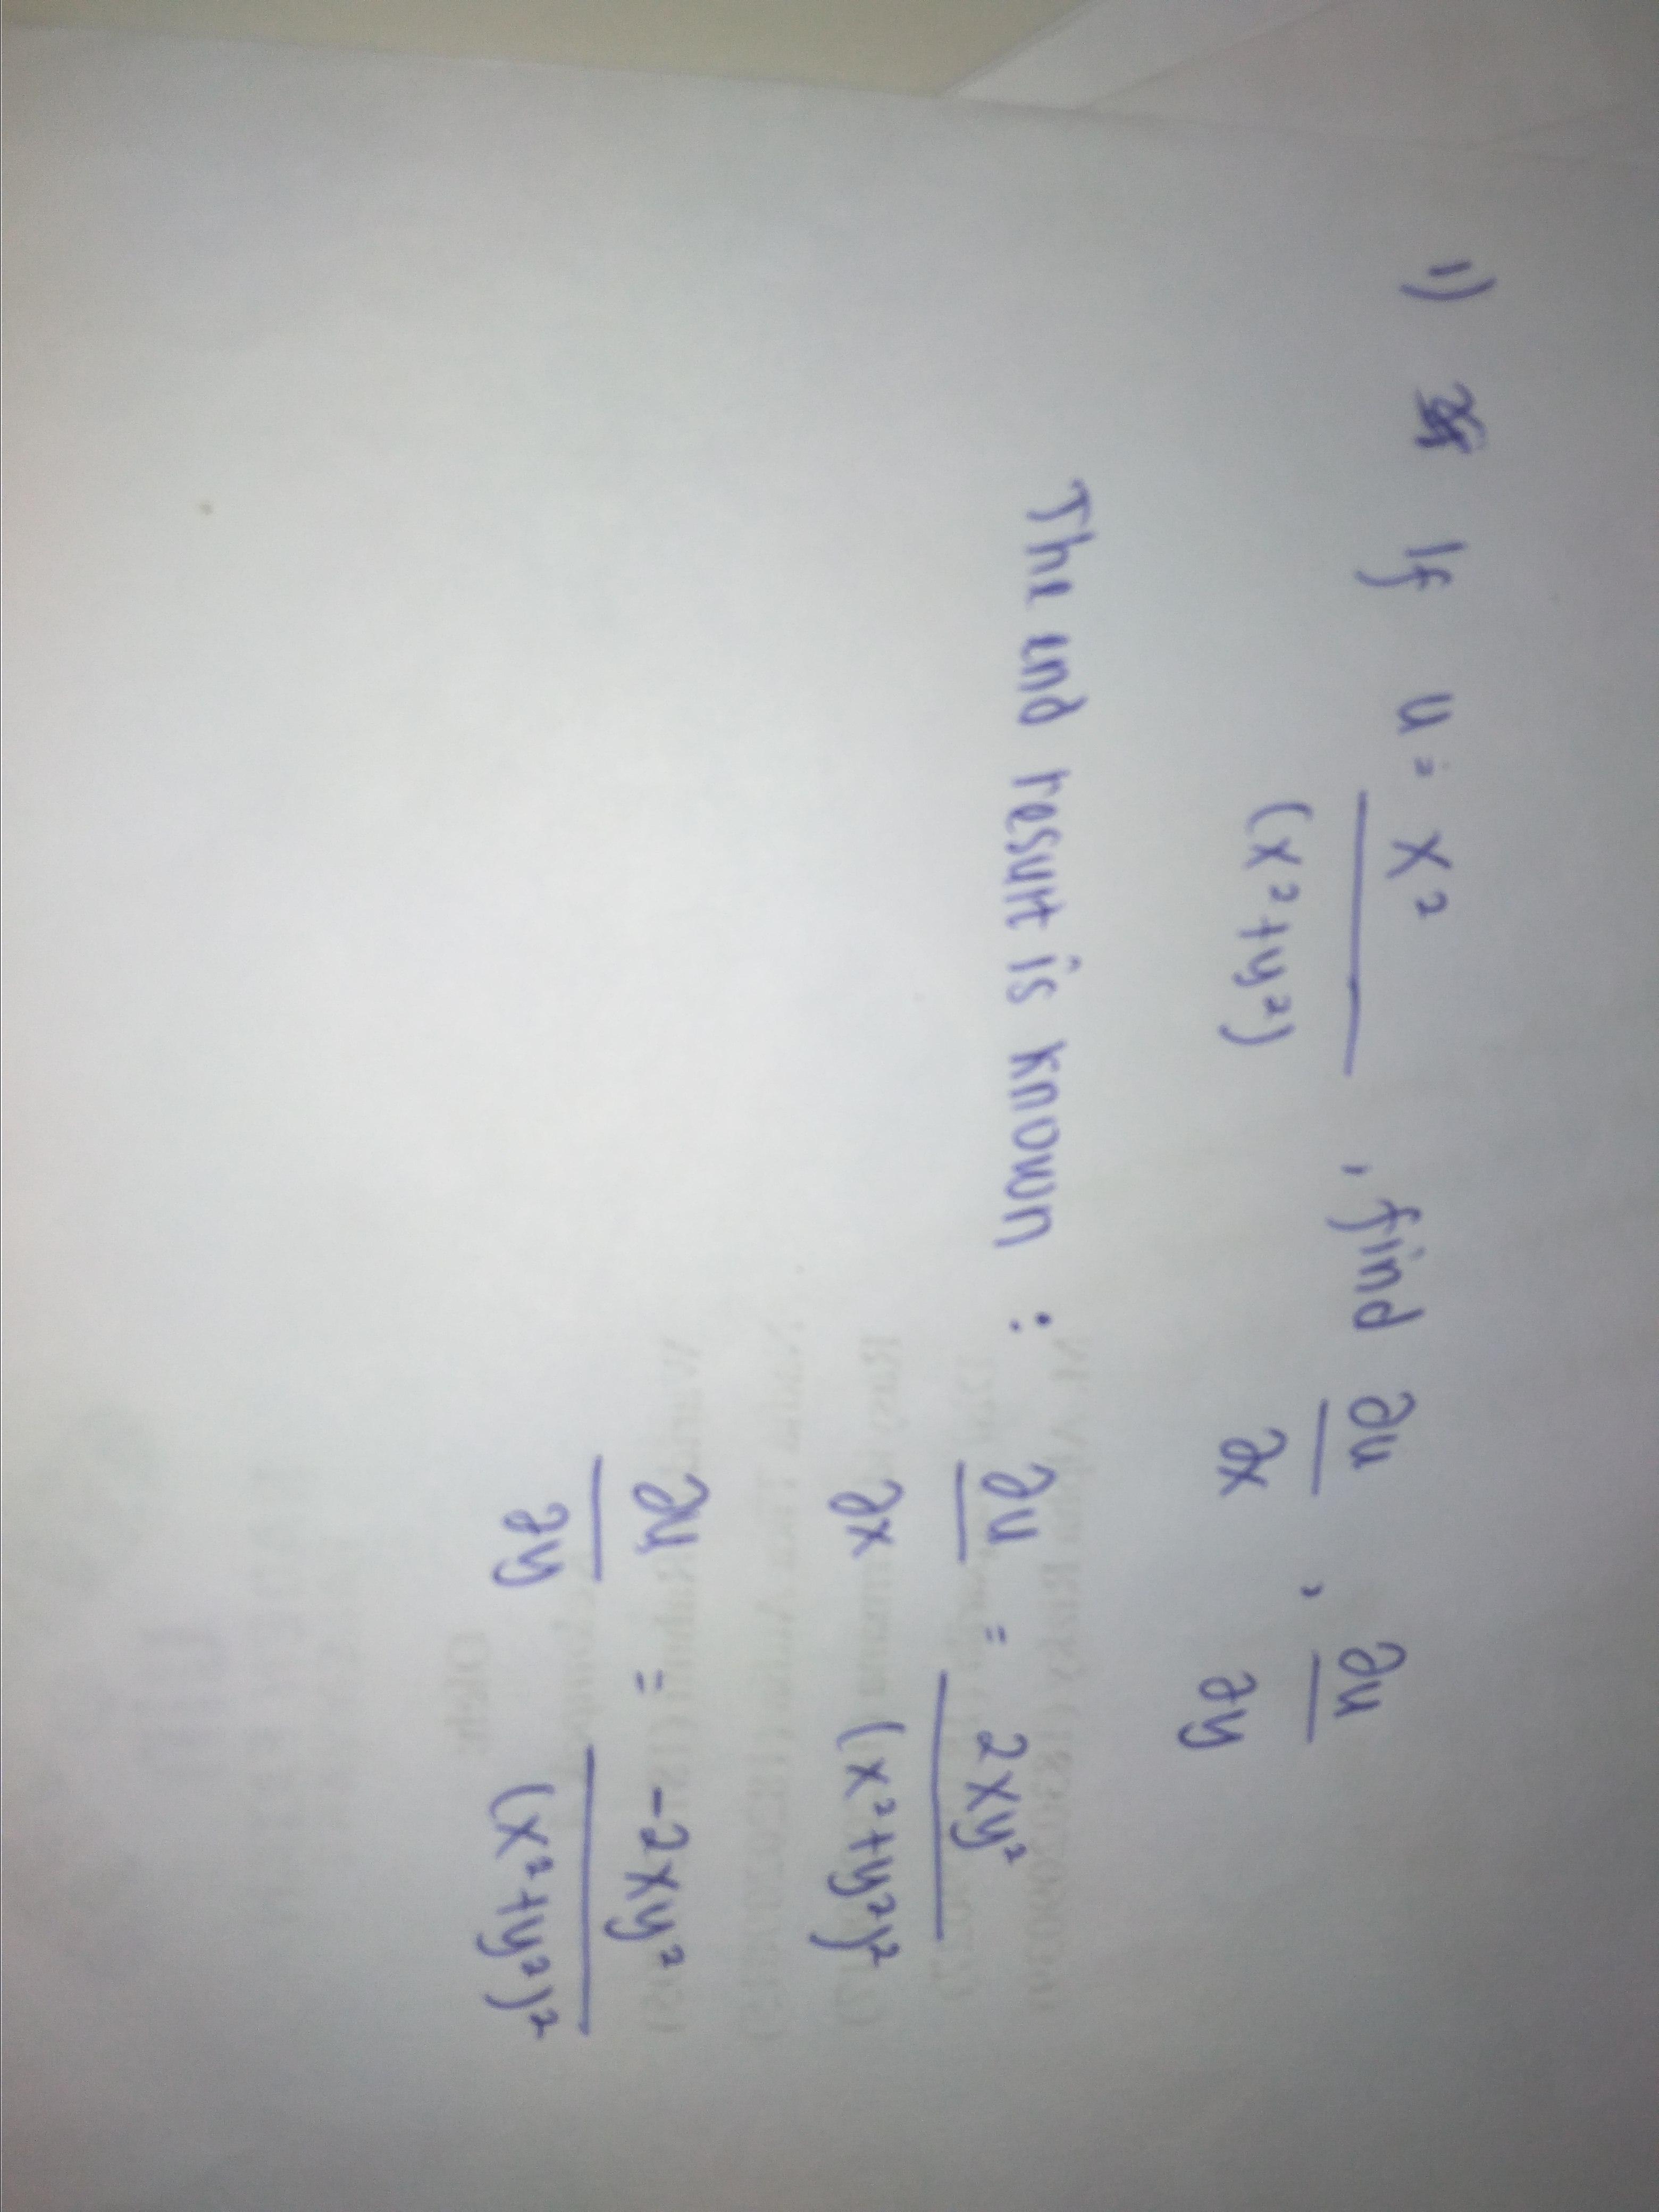 ) 34 , find au aк (enteX) The end resurt is known: 2xy 2х (x*+yoy -2xy (x*ty=ja